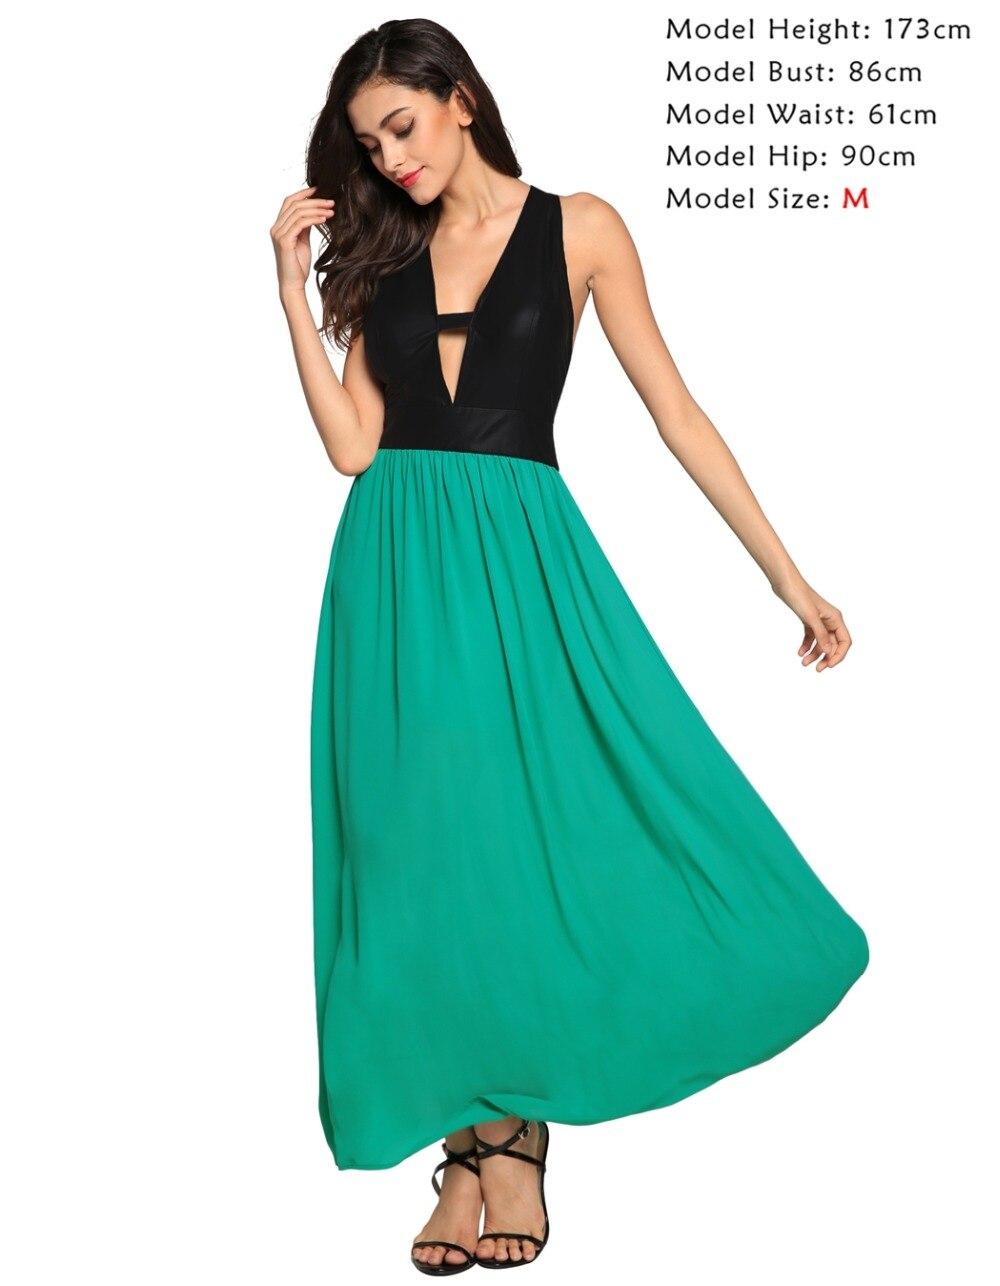 Finejo Women Sexy Club Dress 2016 Green Patchwork Deep V neck ...